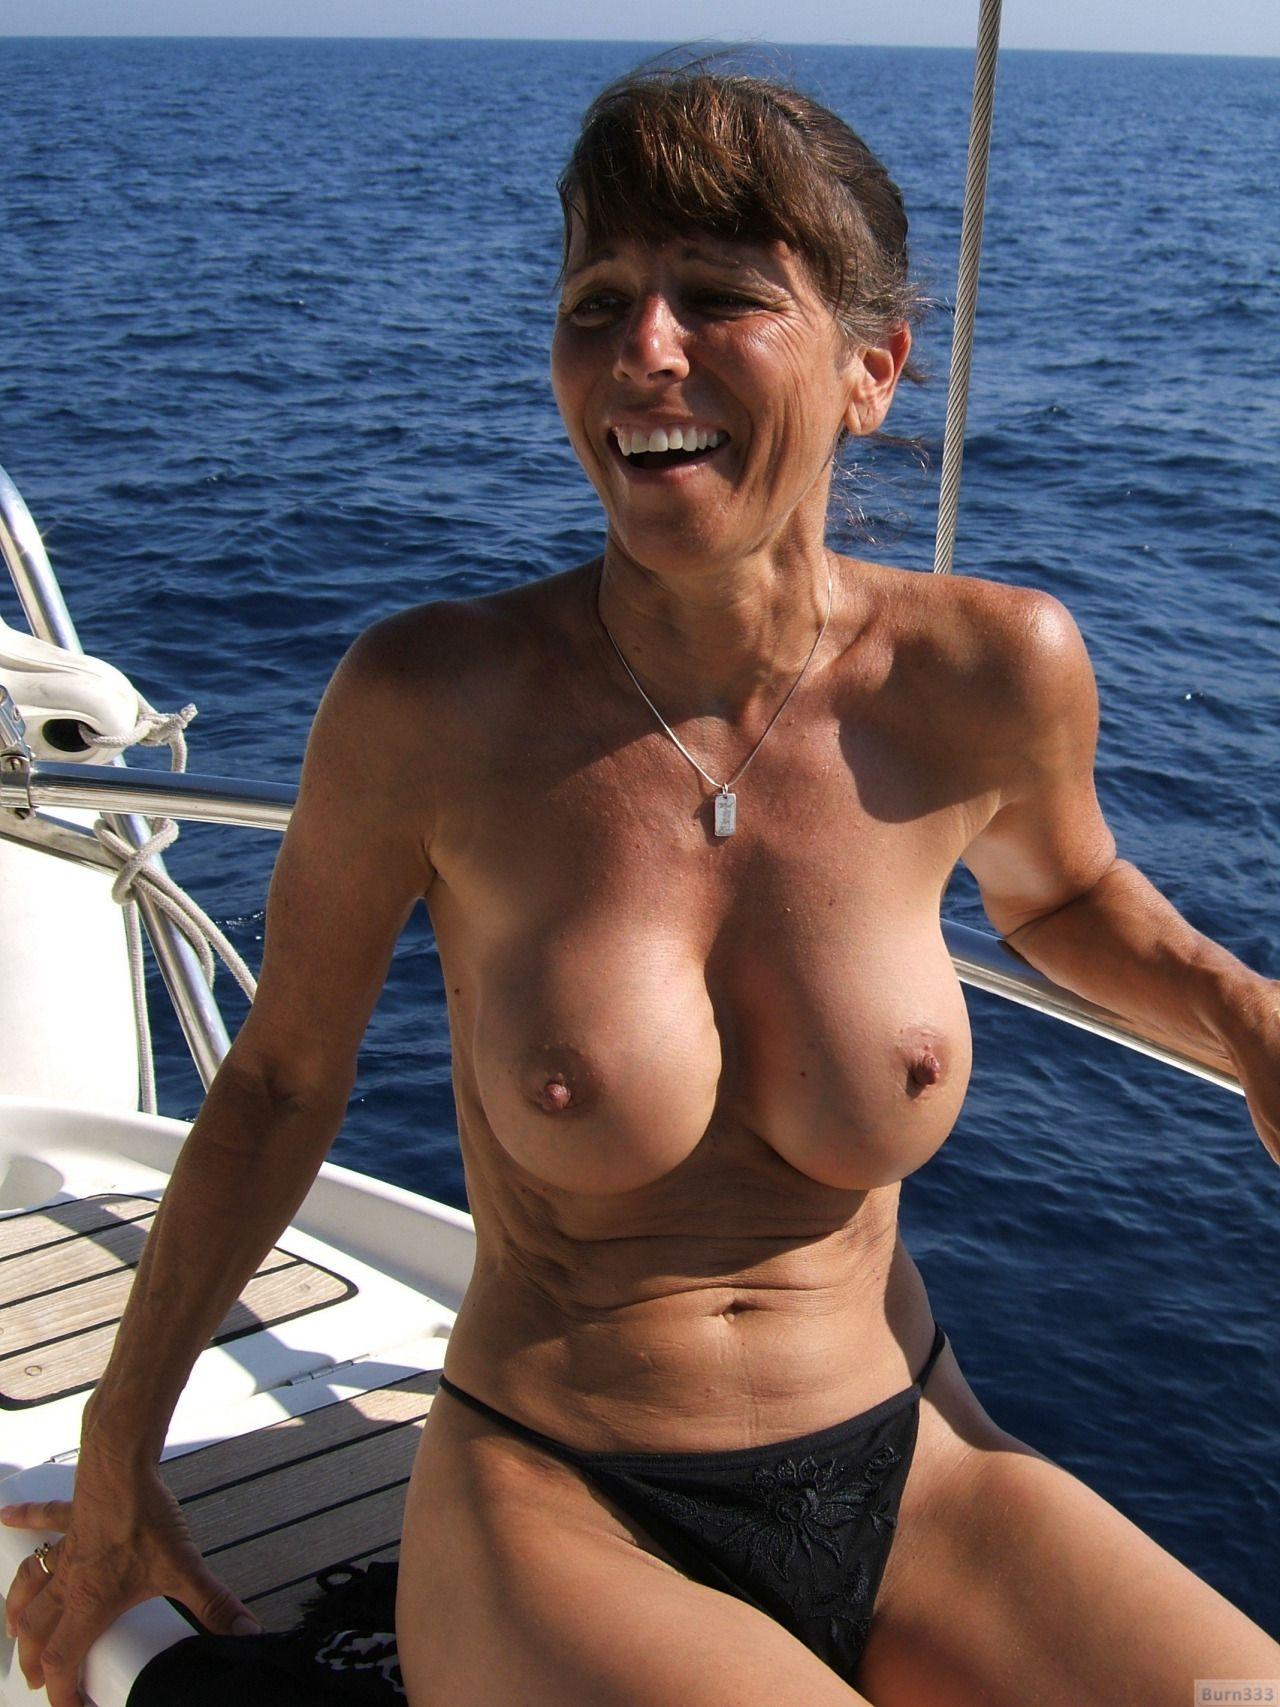 Mature Sex  Mature Nude Women On Boats-3959